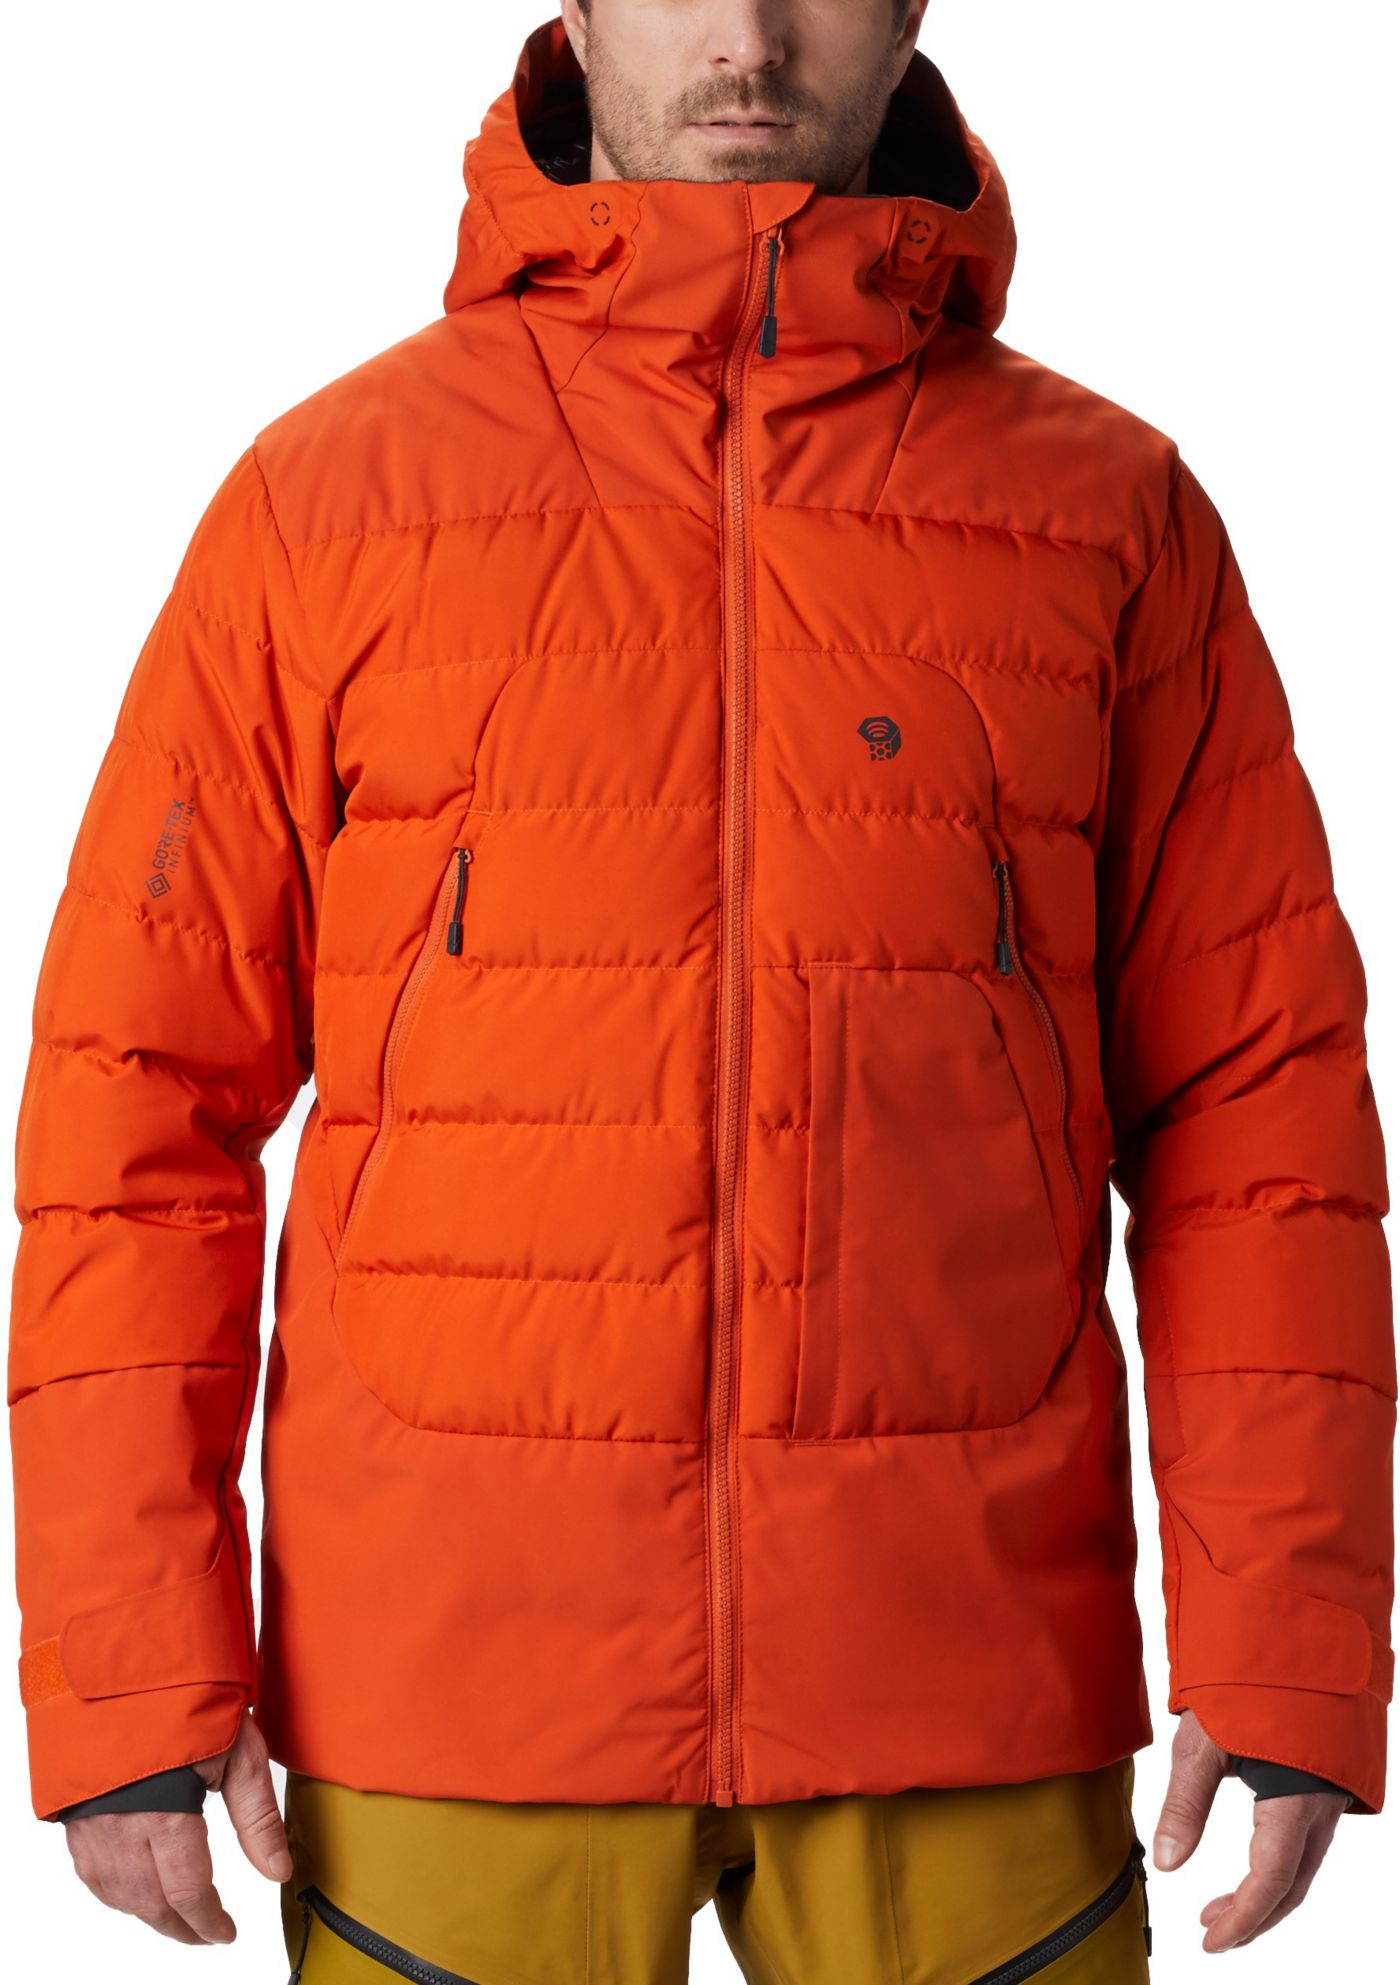 Mountain Hardwear Men's Direct North Gore-Tex Windstopper Down Jacket